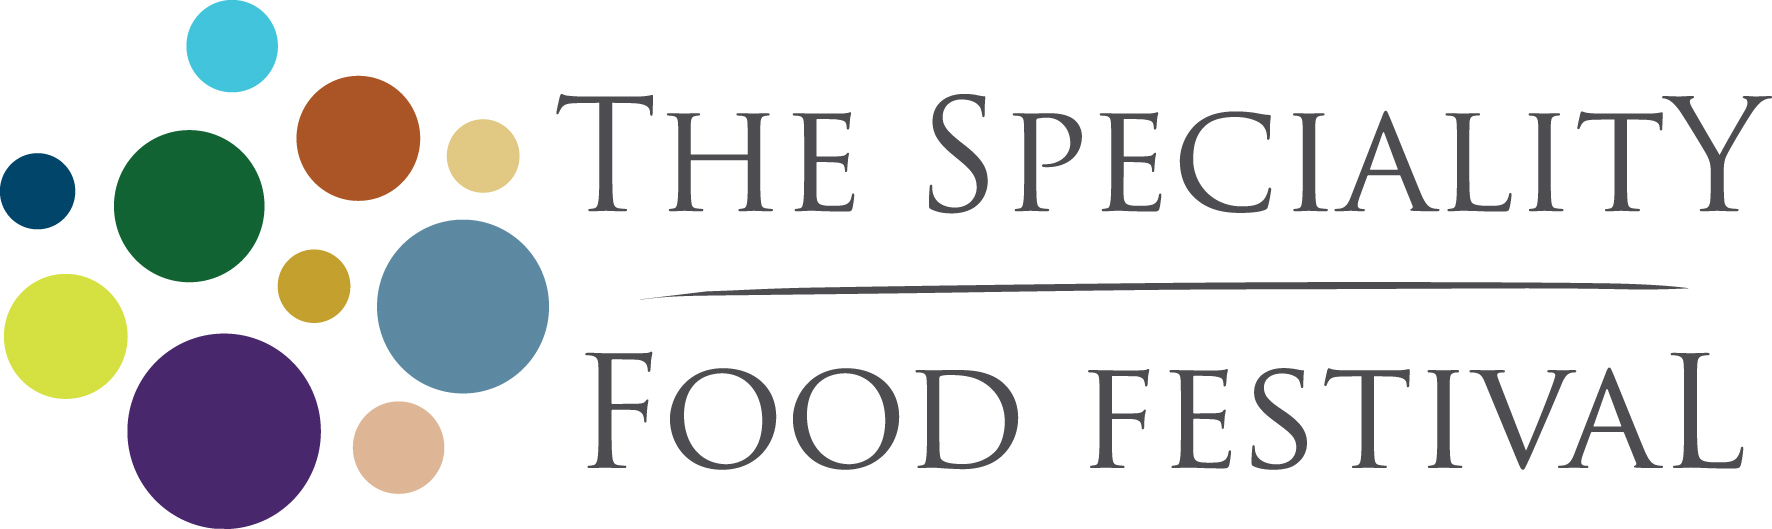 Events-logo